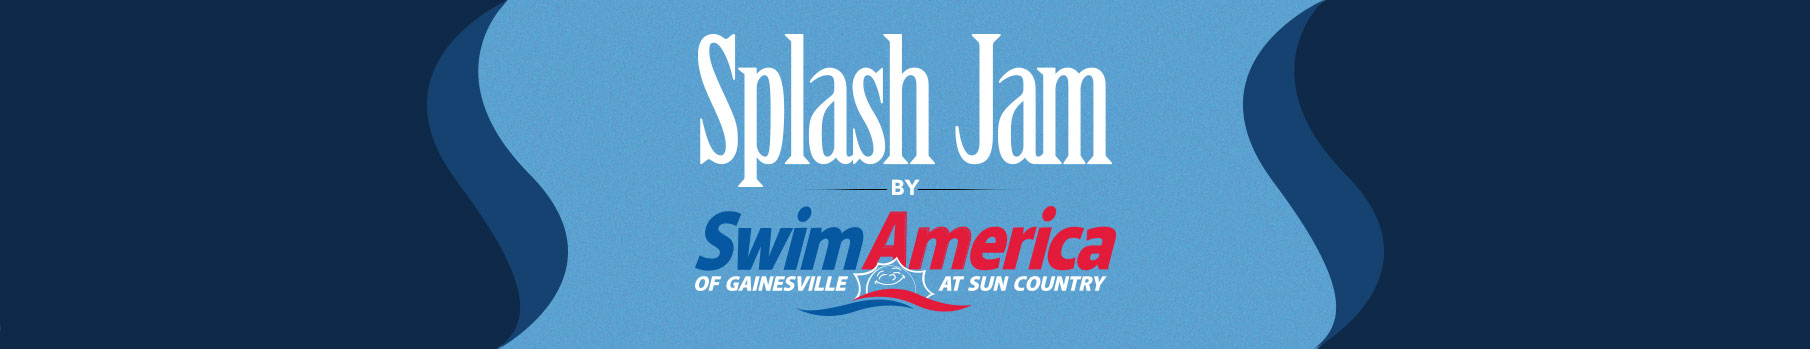 splashjam-2020